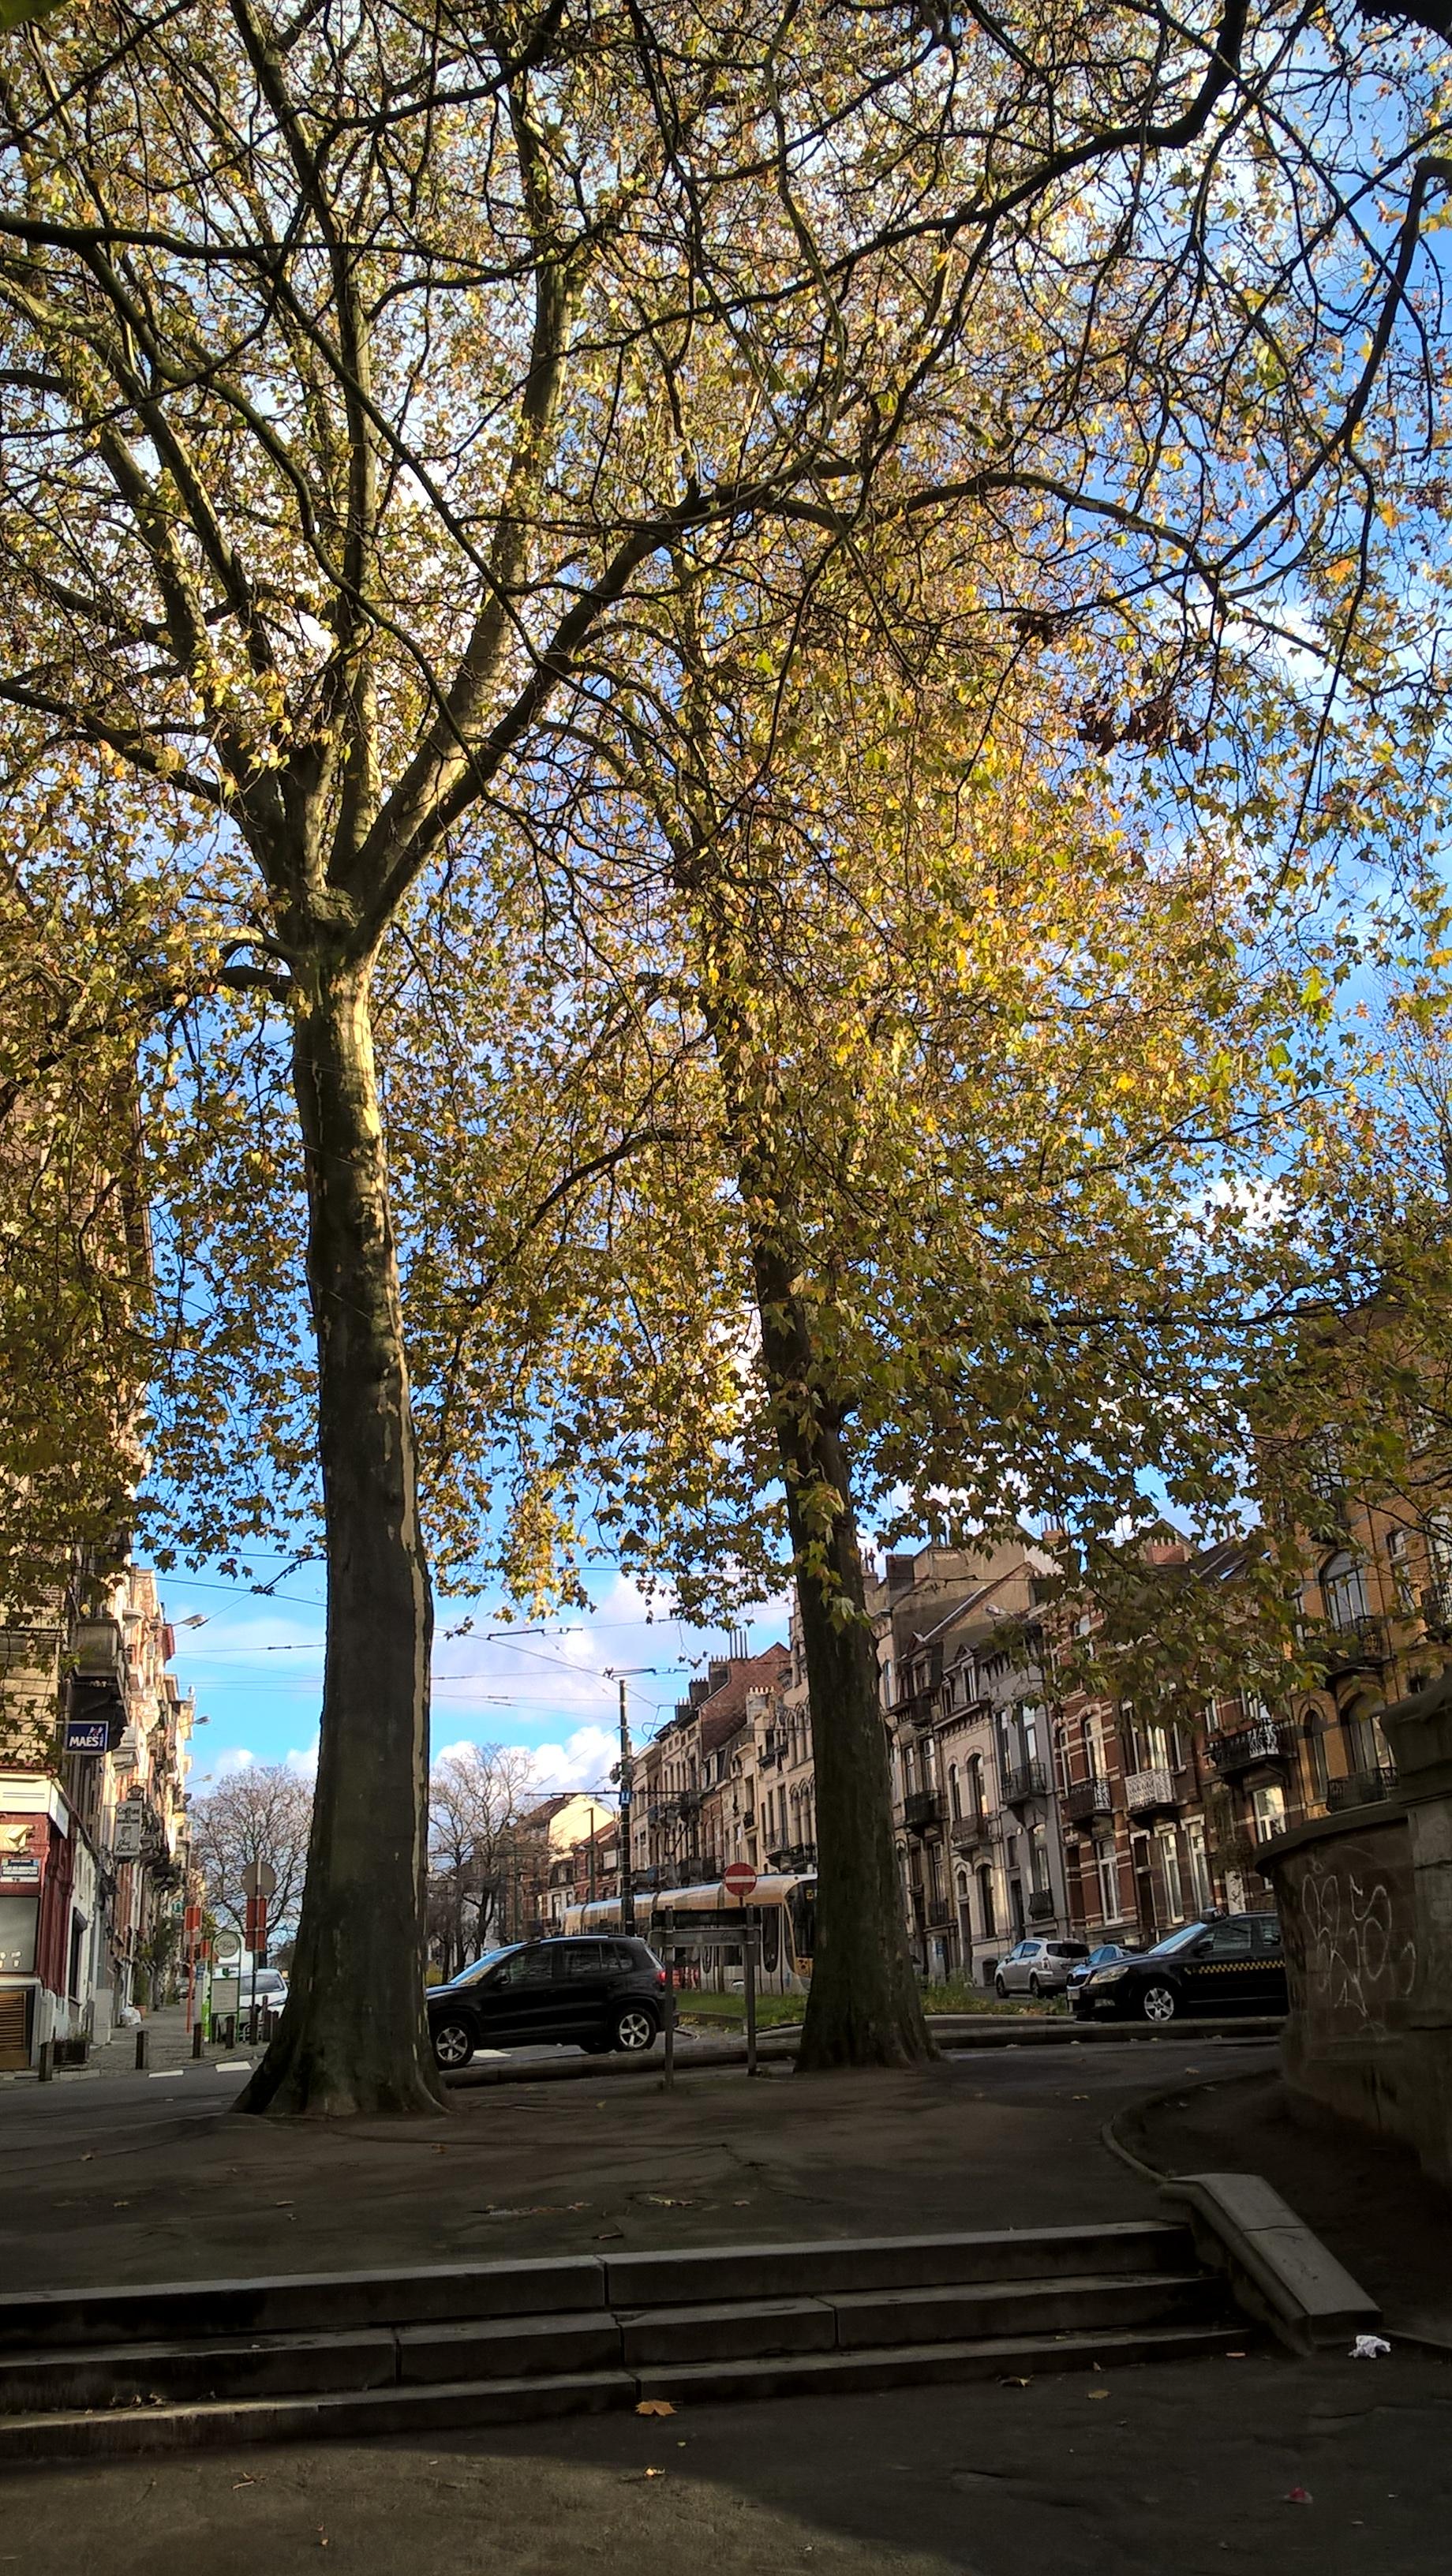 Platane à feuille d'érable – Schaerbeek, Place des Bienfaiteurs, Place des Bienfaiteurs –  28 Novembre 2017